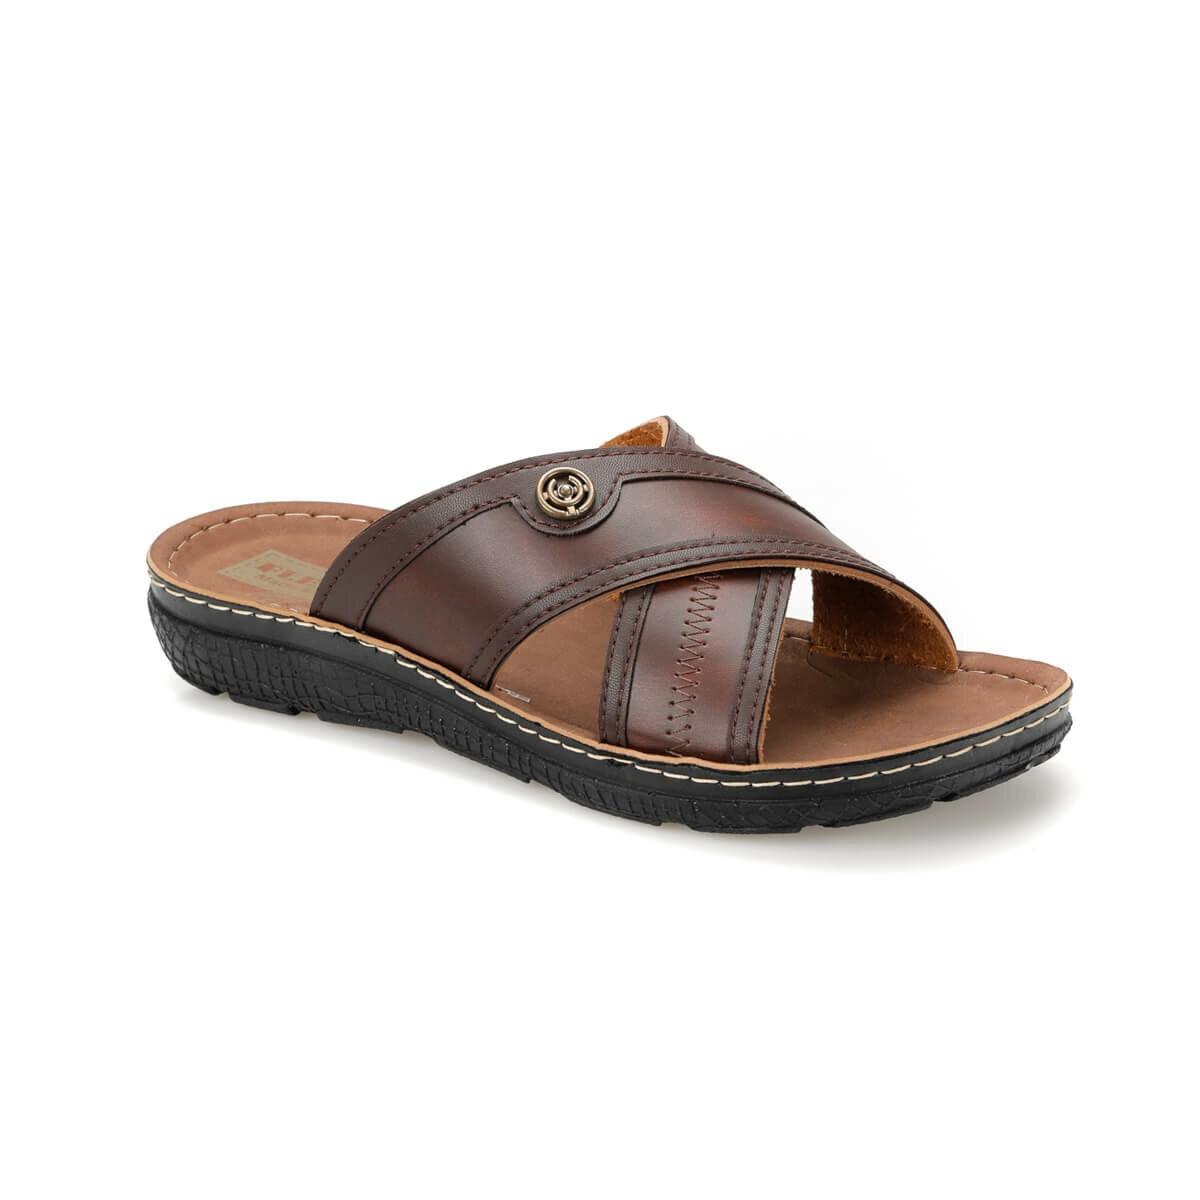 Flo LX-4937 c brown masculino chinelos flexall